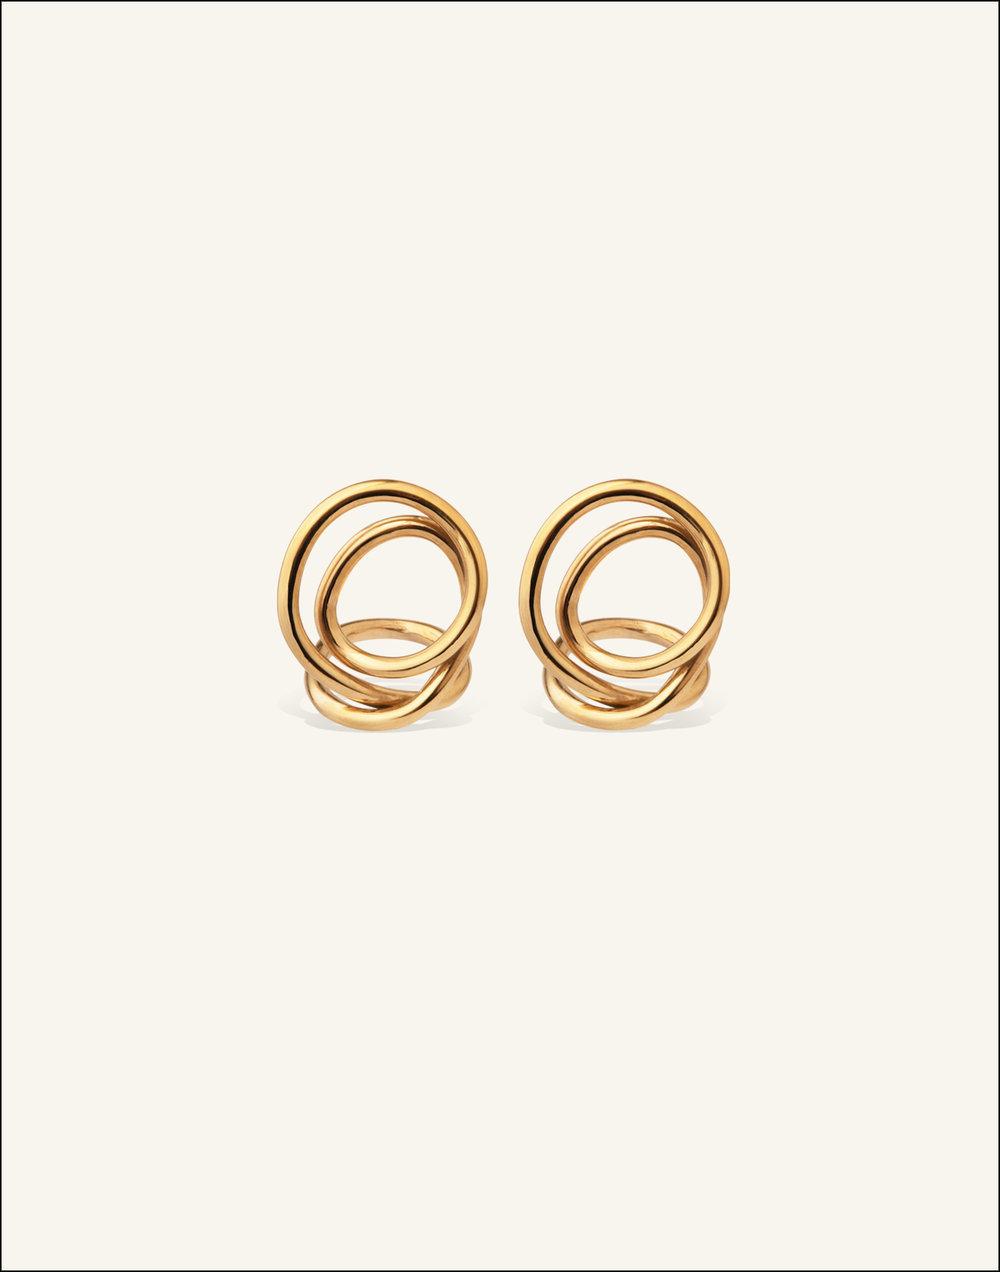 Completedworks-Earrings-The-Philosopher-1-1.jpg